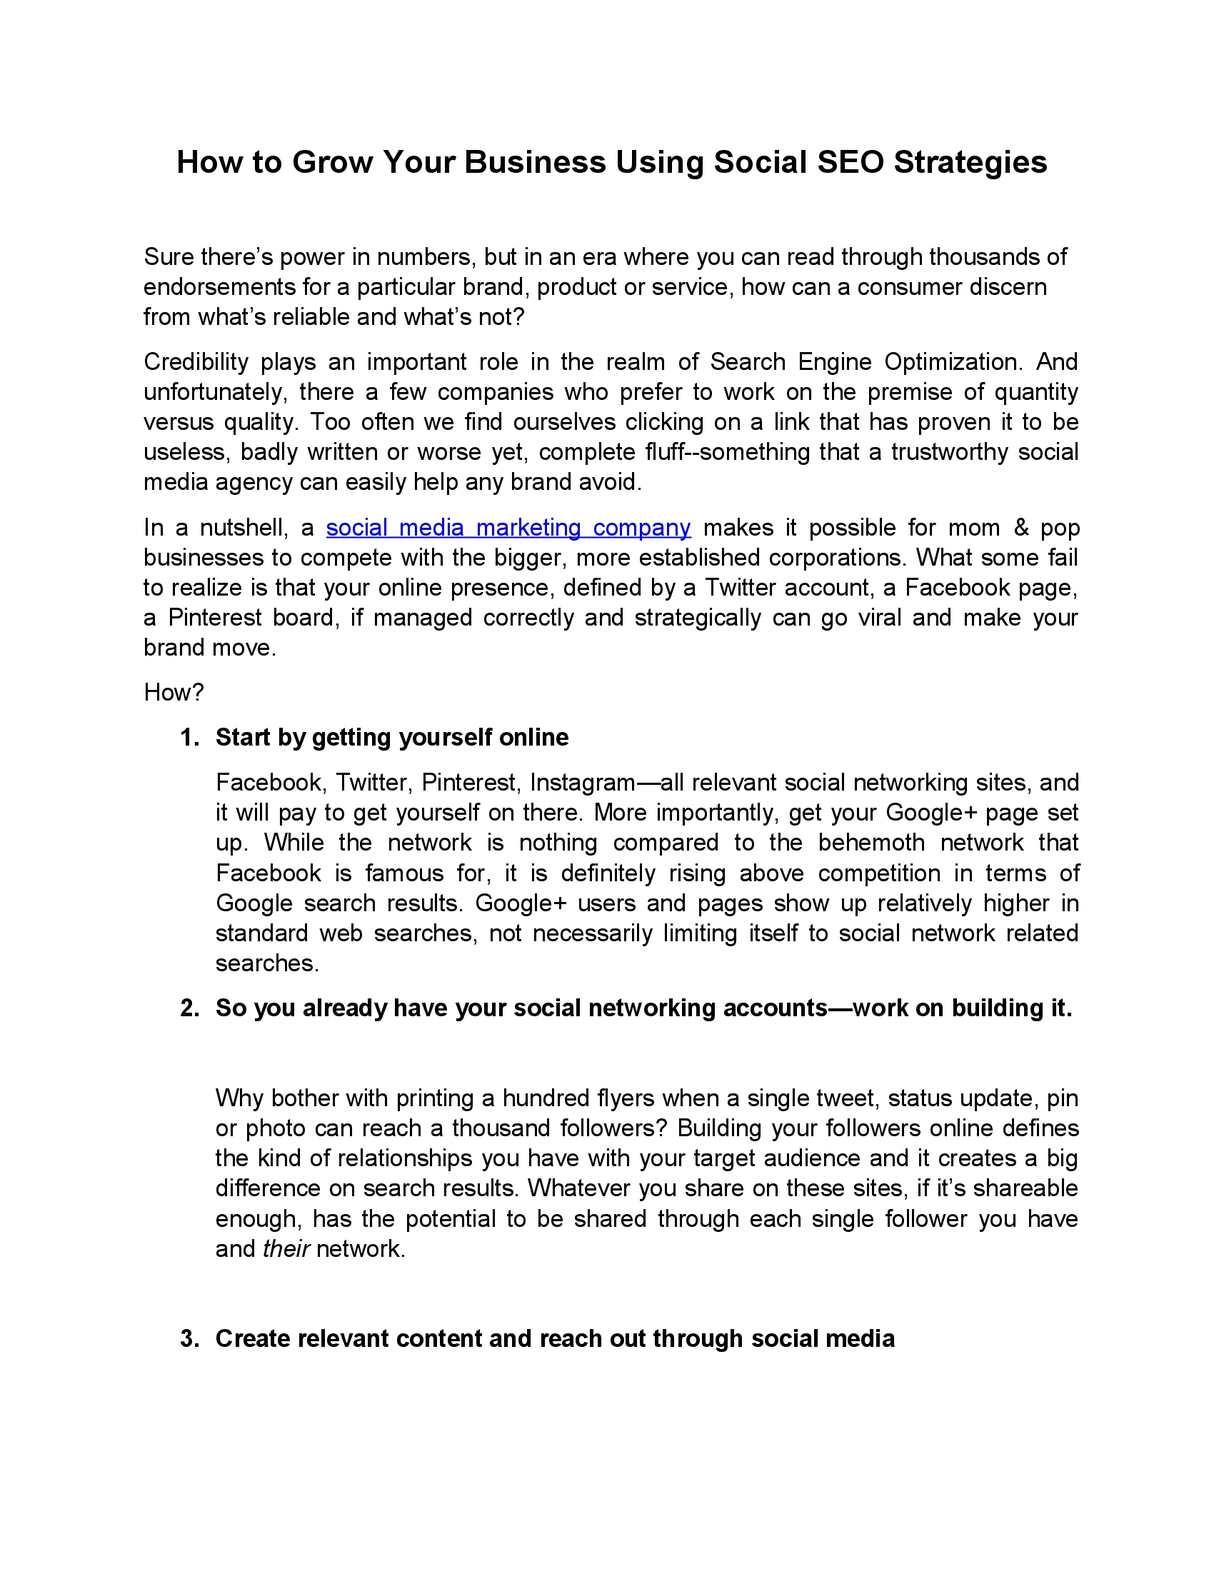 Calaméo - How to Grow Your Business Using Social SEO Strategies